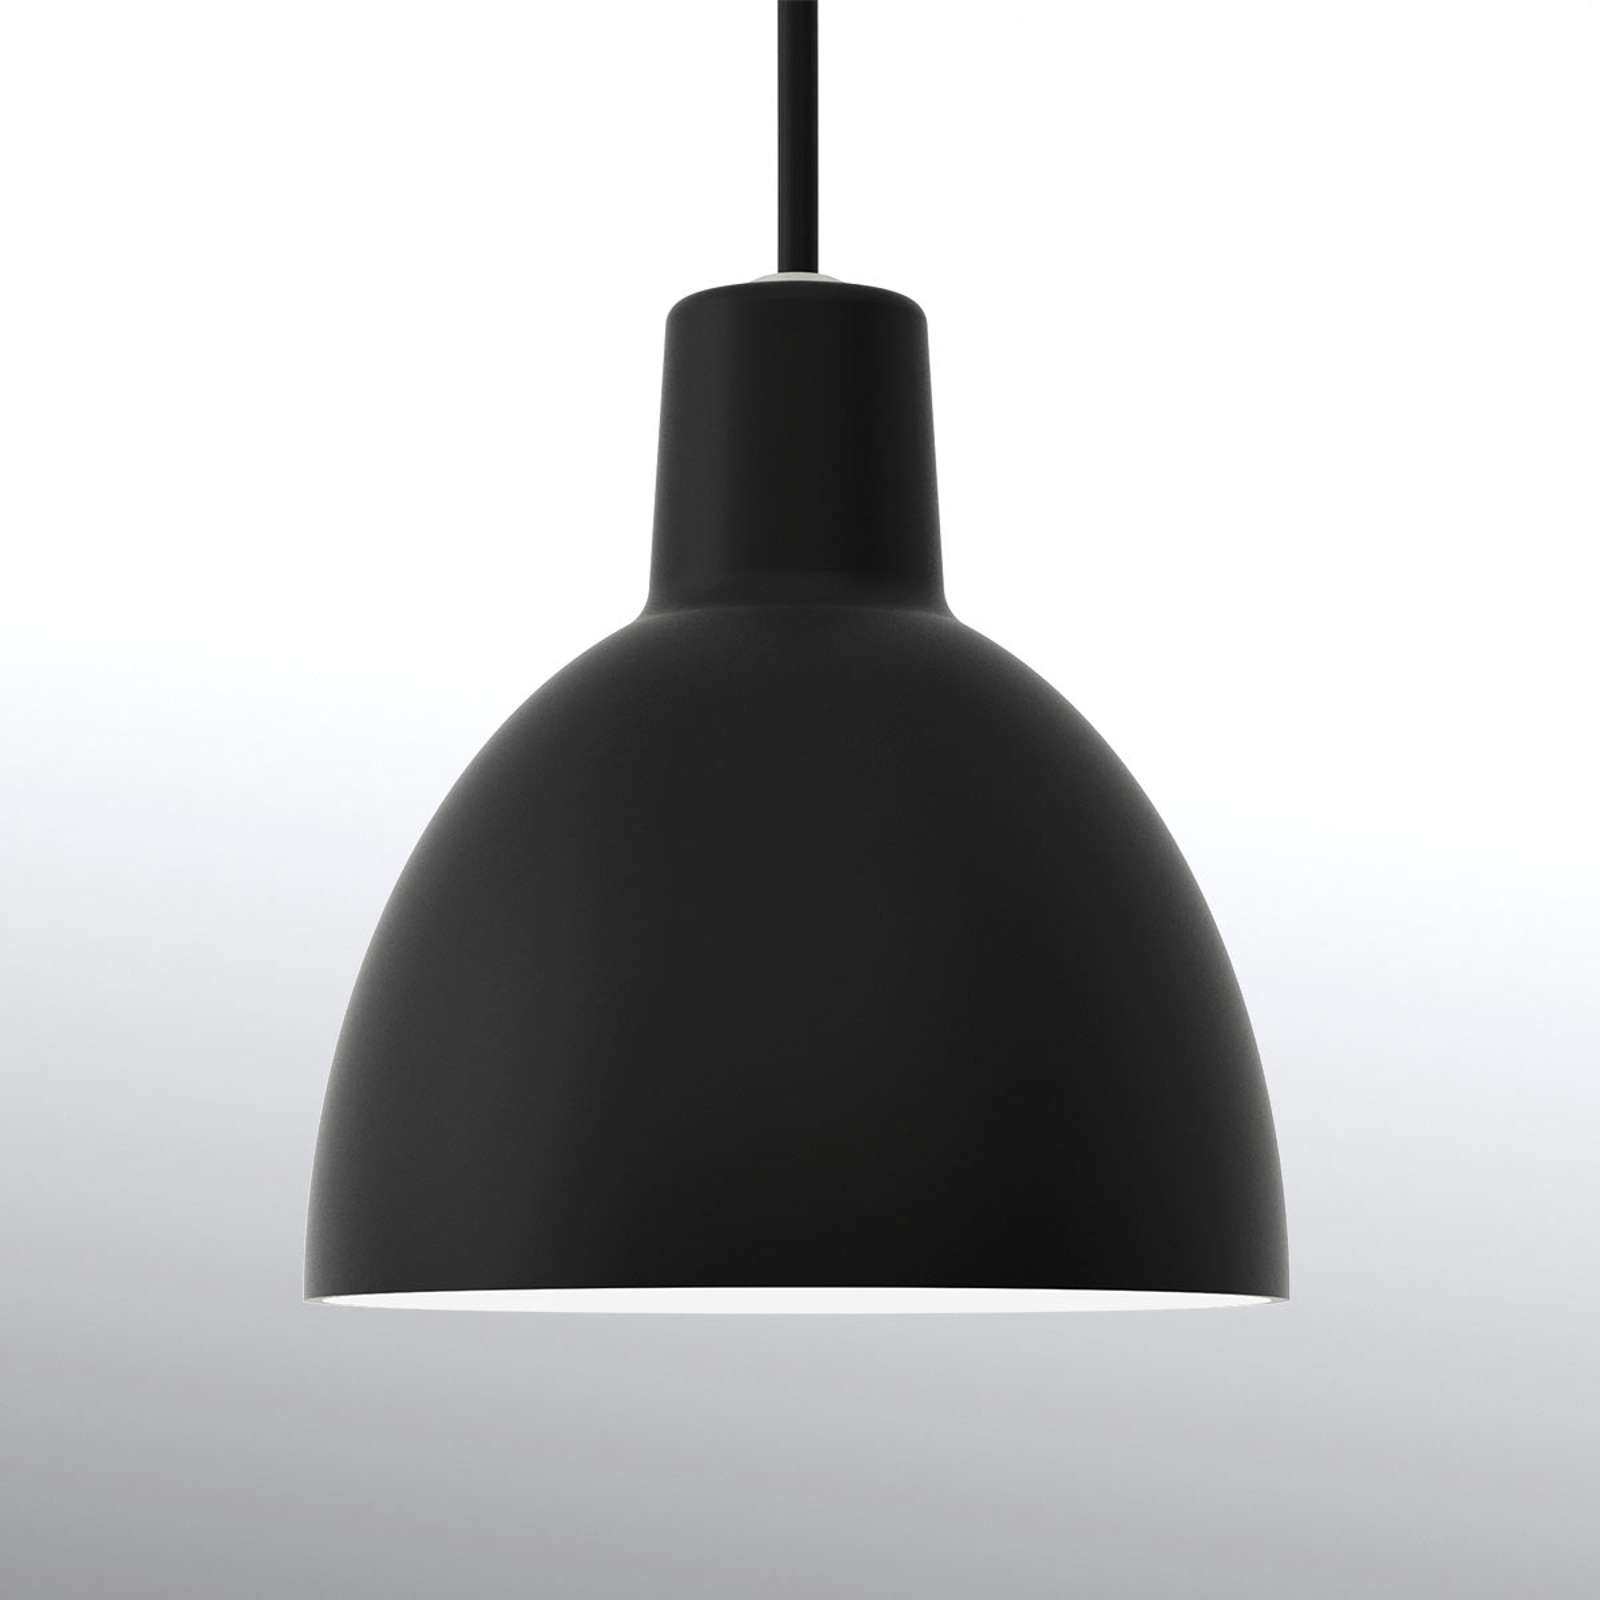 Louis Poulsen Toldbod 120, lampa wisząca, czarna